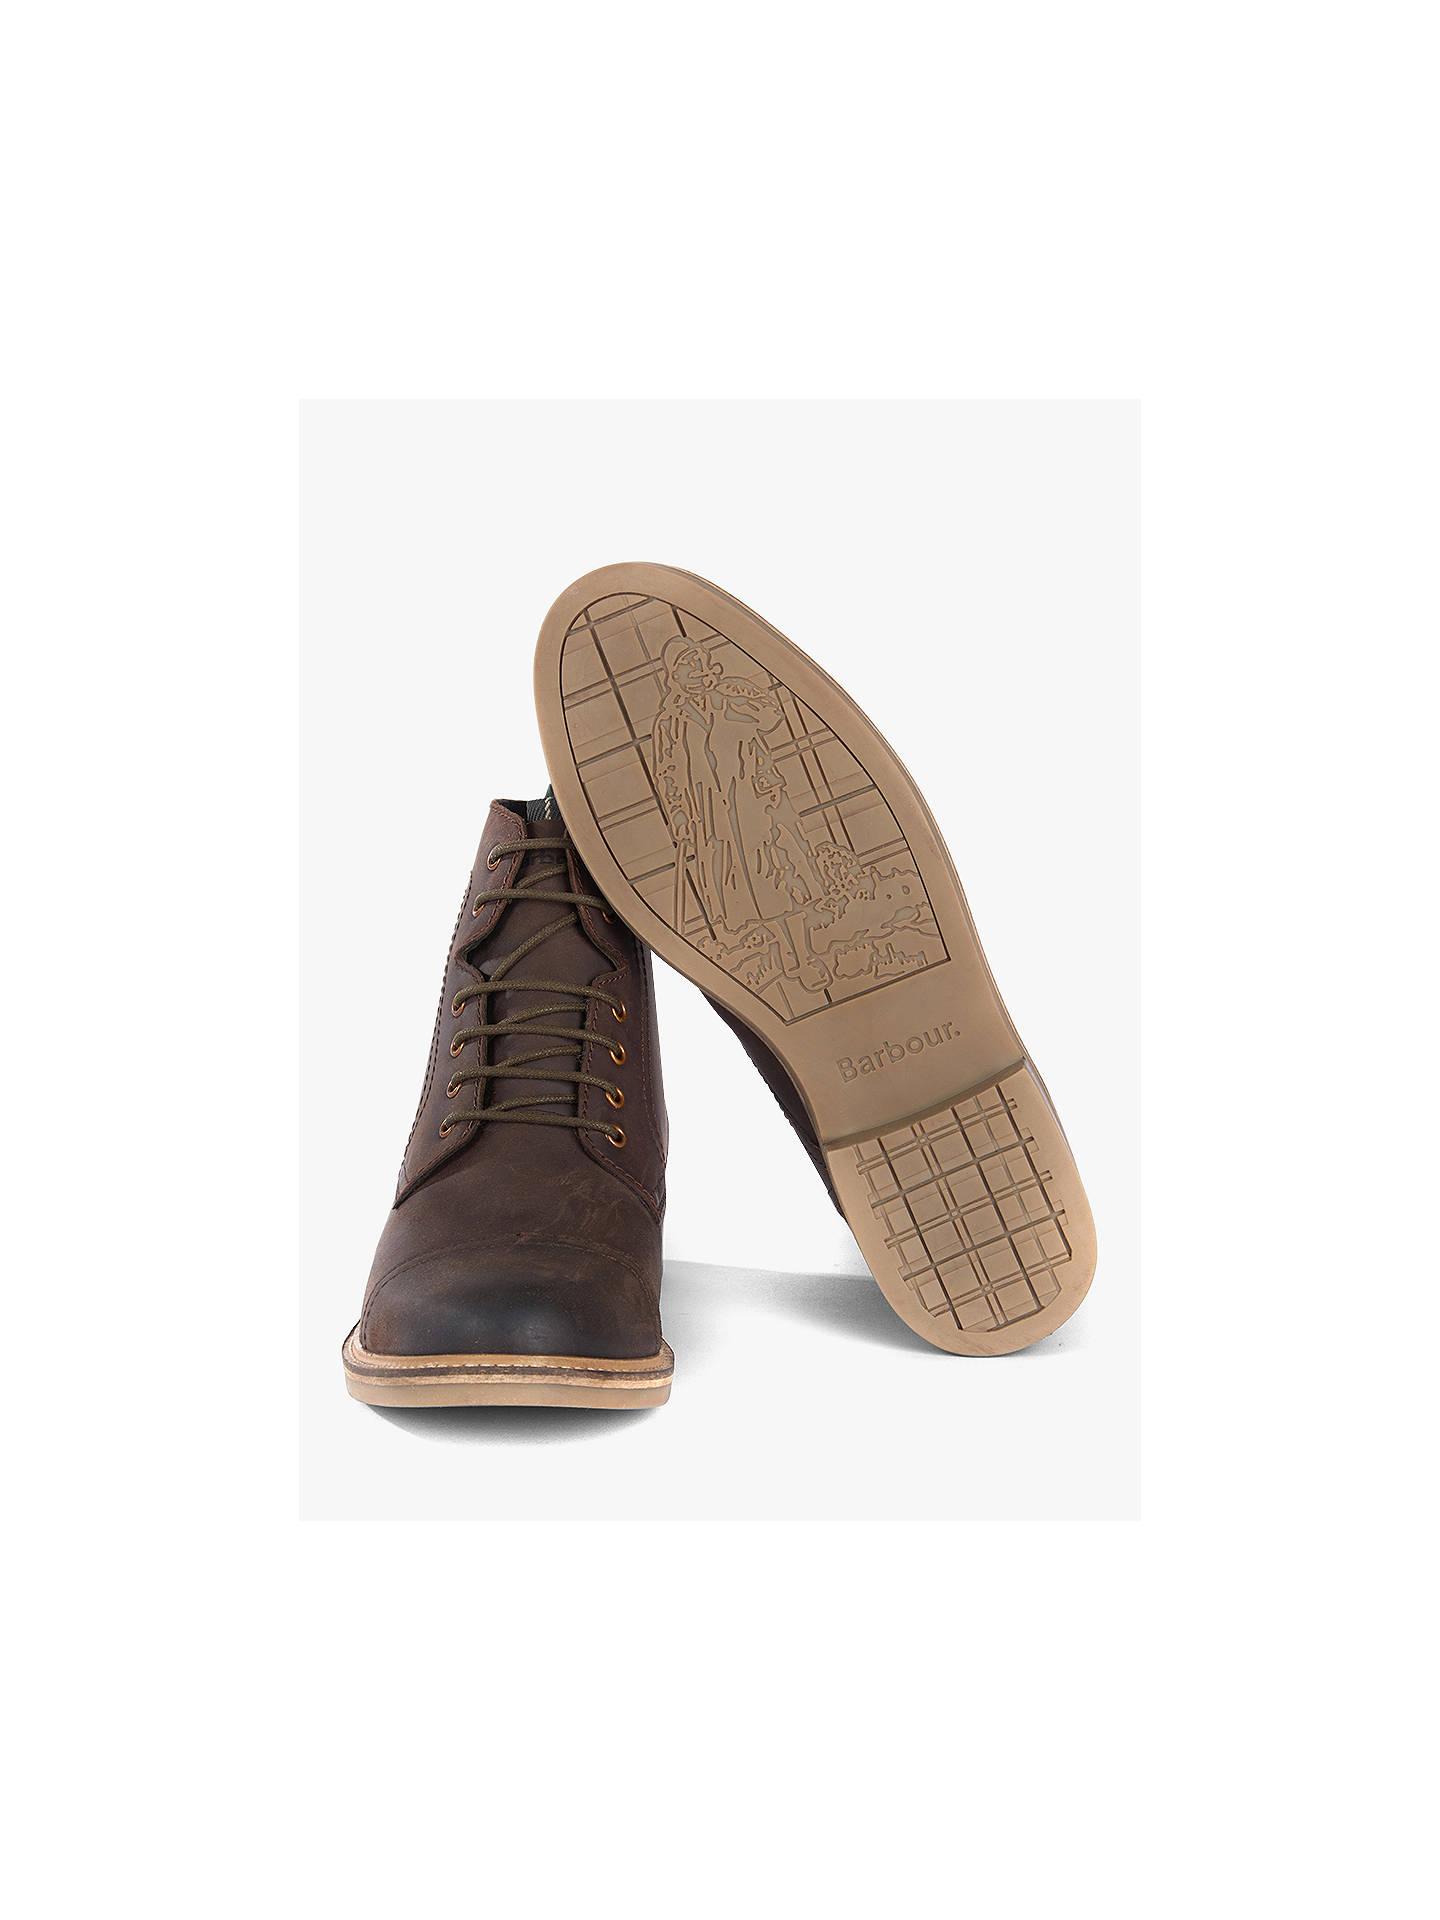 da454ea834c Barbour Dalton Boots, Chocolate at John Lewis & Partners